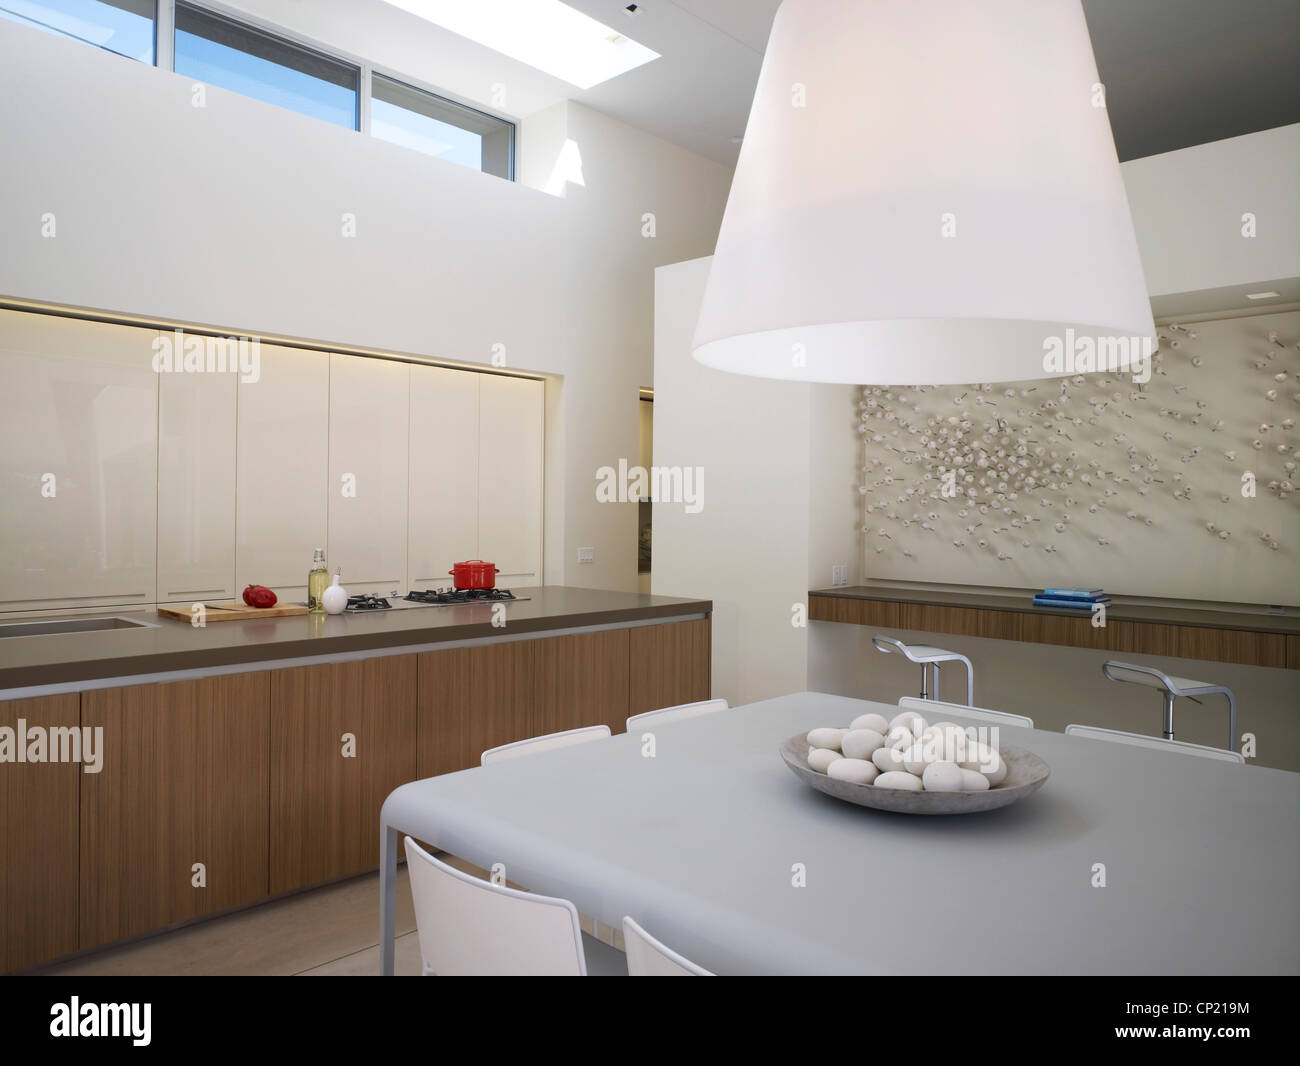 Open plan kitchen in Menlo Park Residence, USA - Stock Image